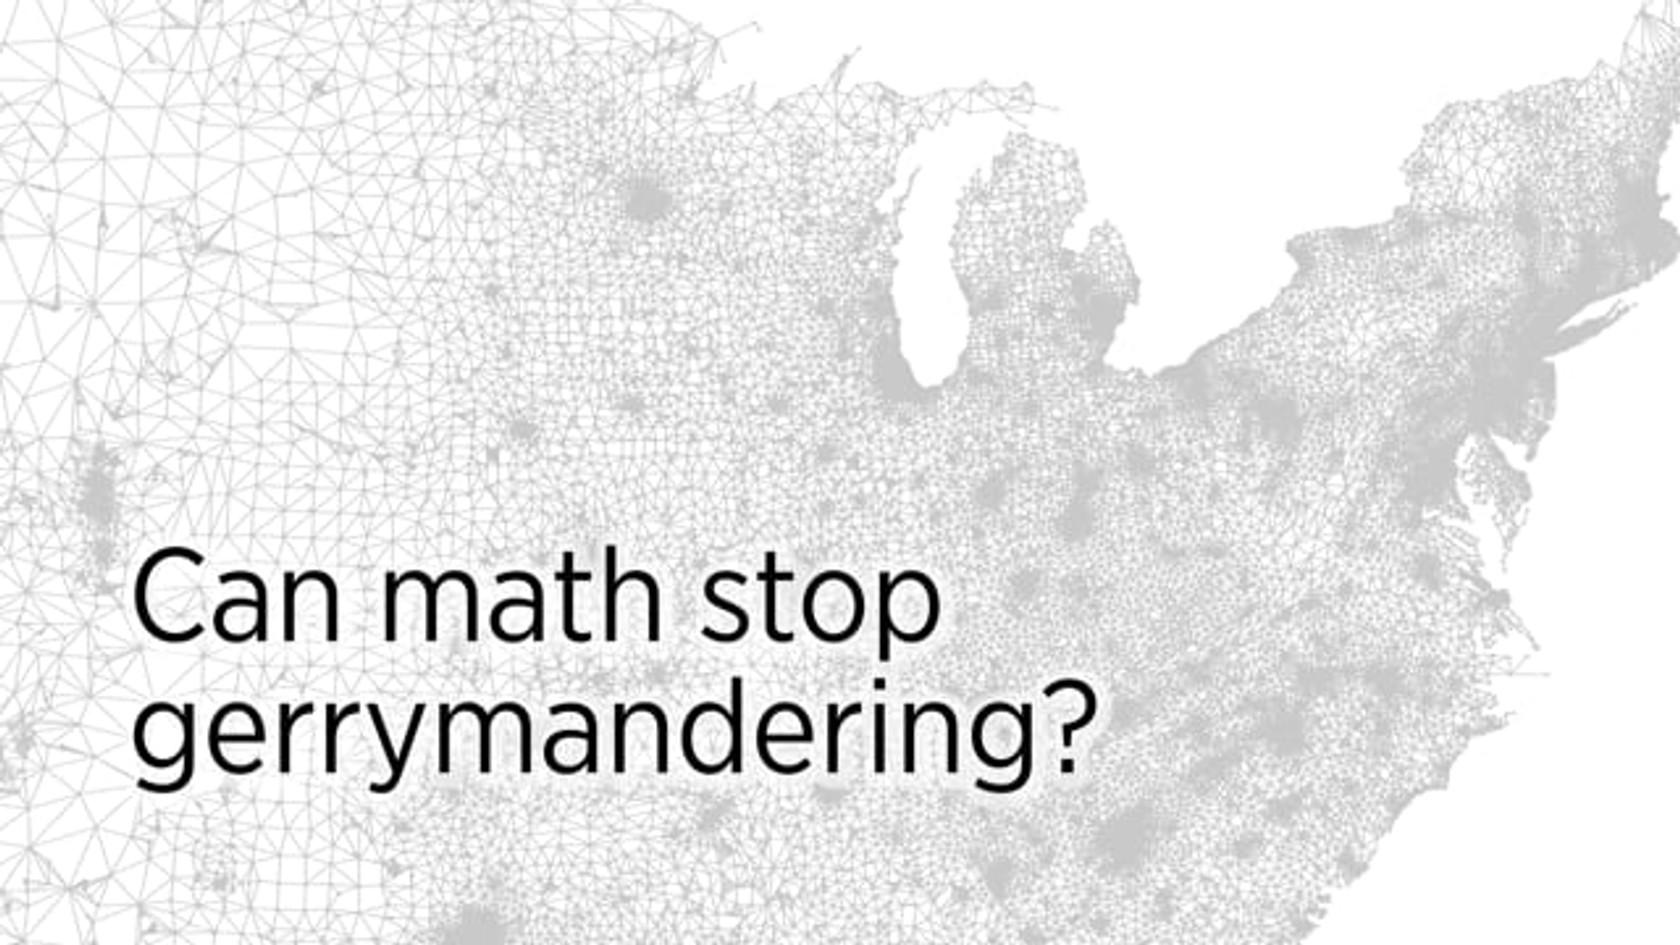 Can Math Stop Gerrymandering?